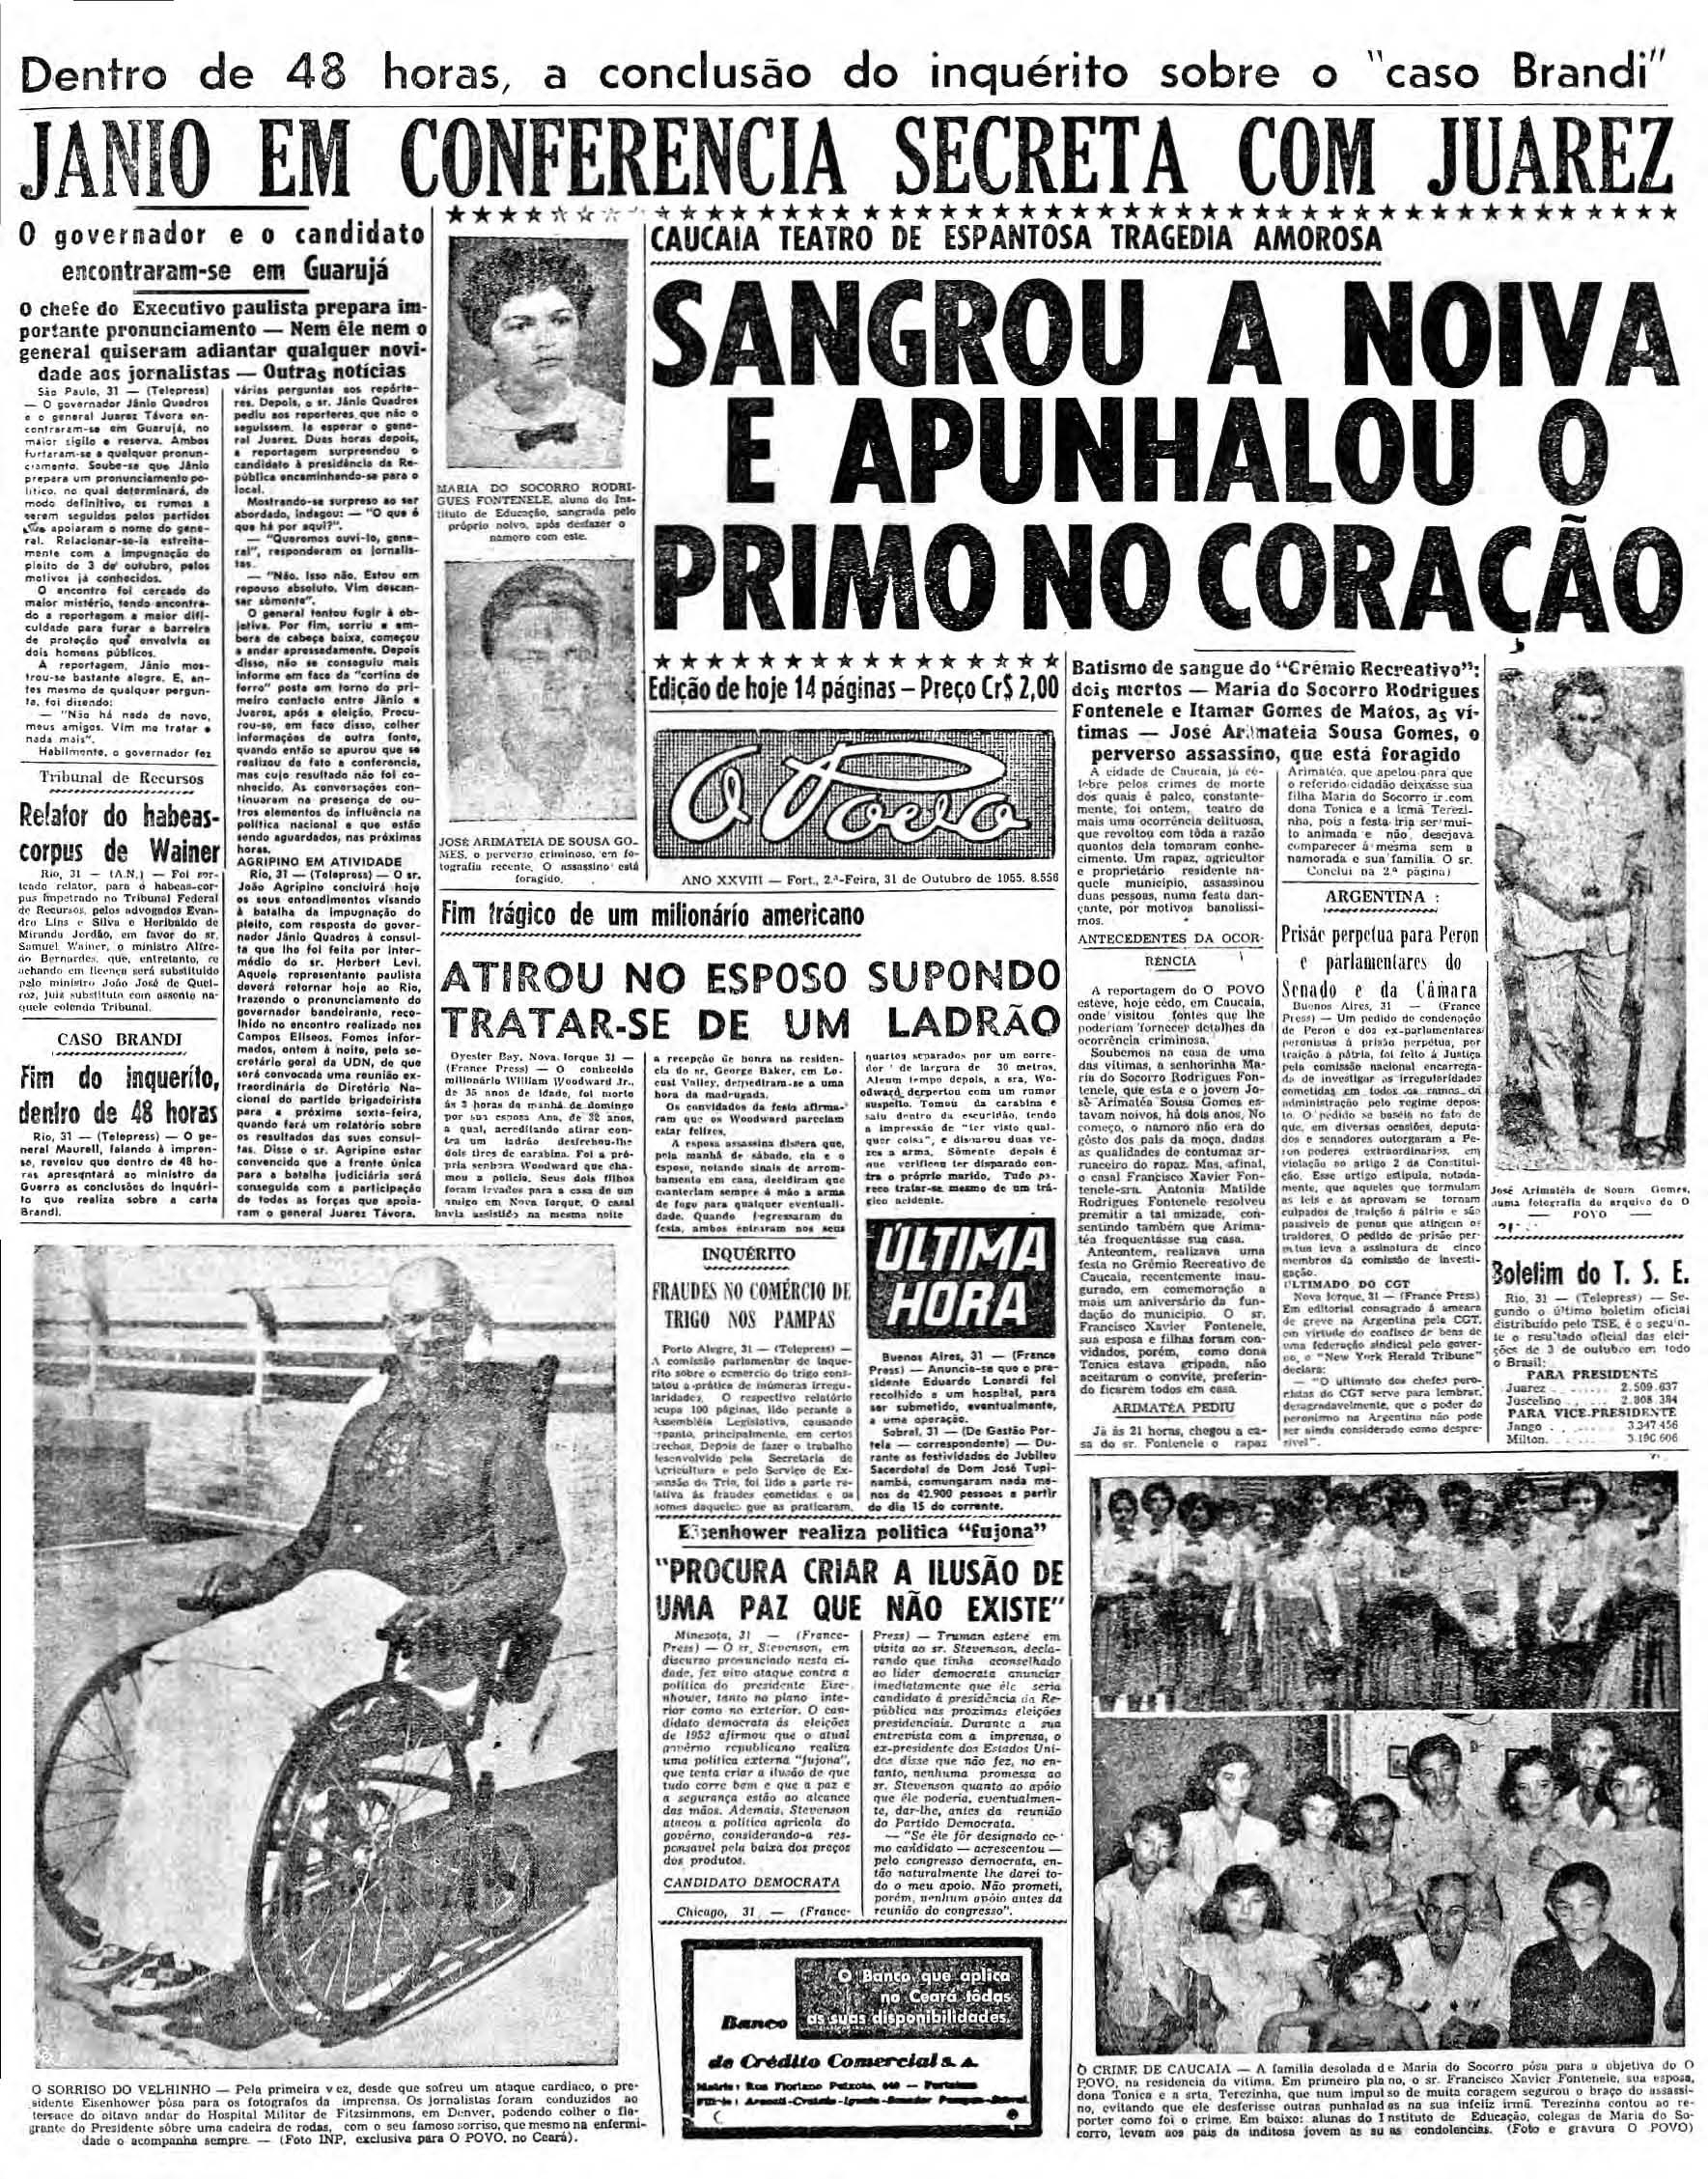 31-10-1955